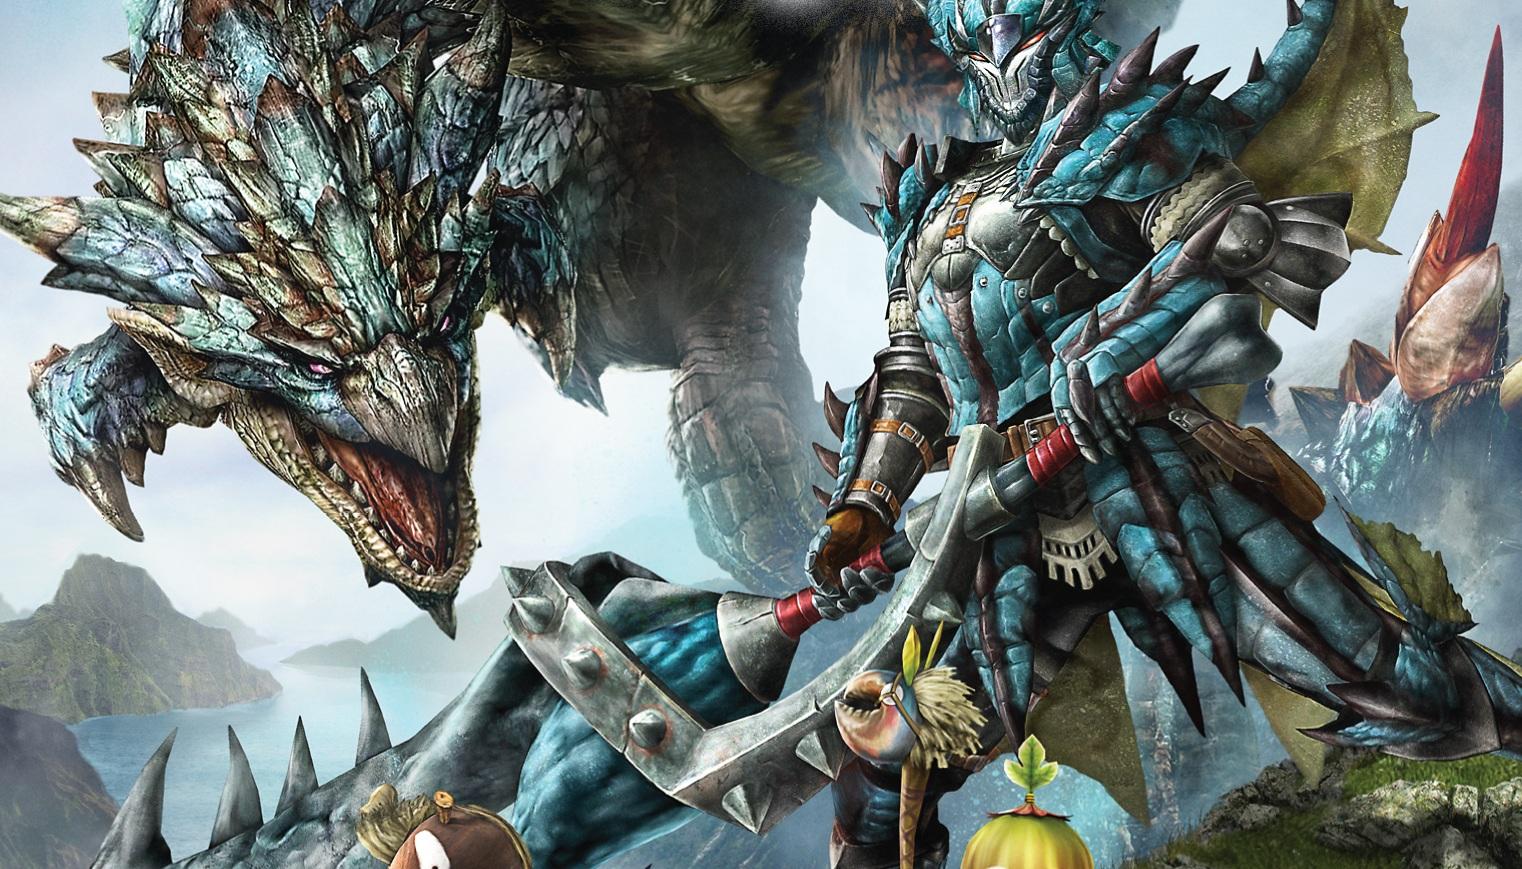 50 Monster Hunter 3 Ultimate Wallpaper On Wallpapersafari